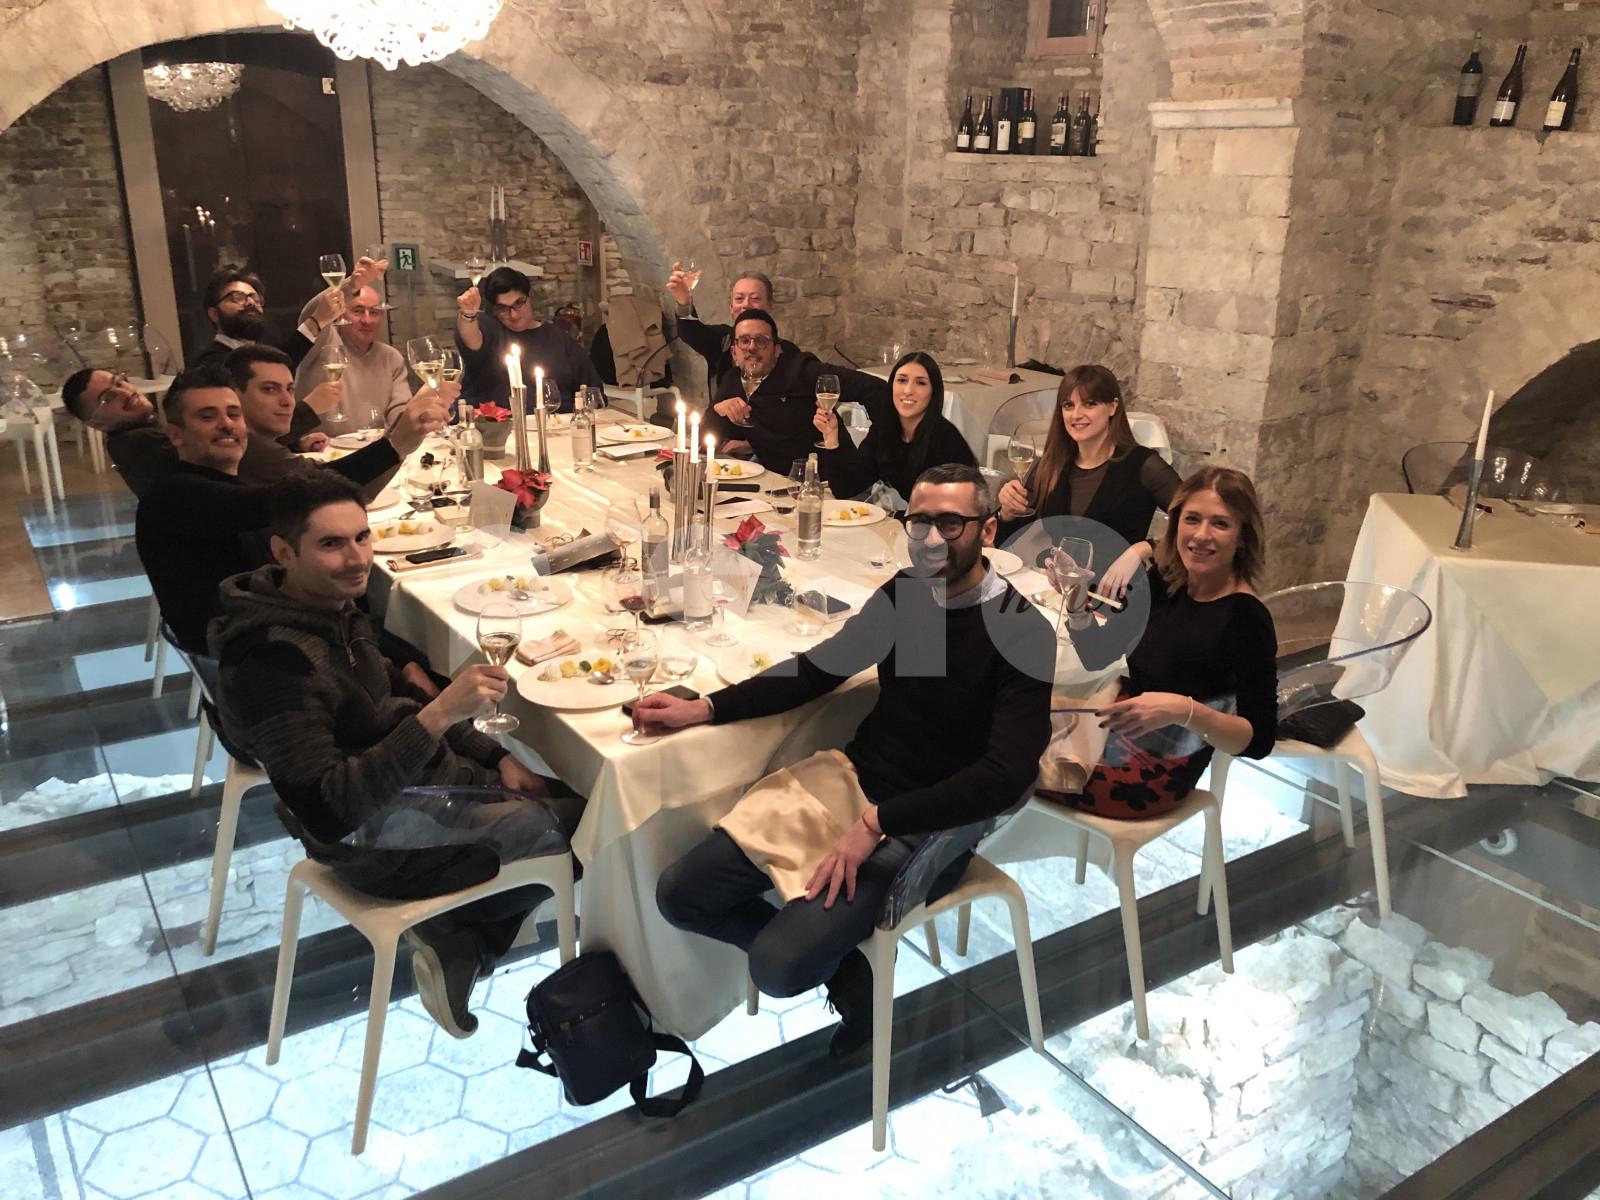 BertiDesign, cena insieme per concludere un entusiasmante 2019 (FOTO)